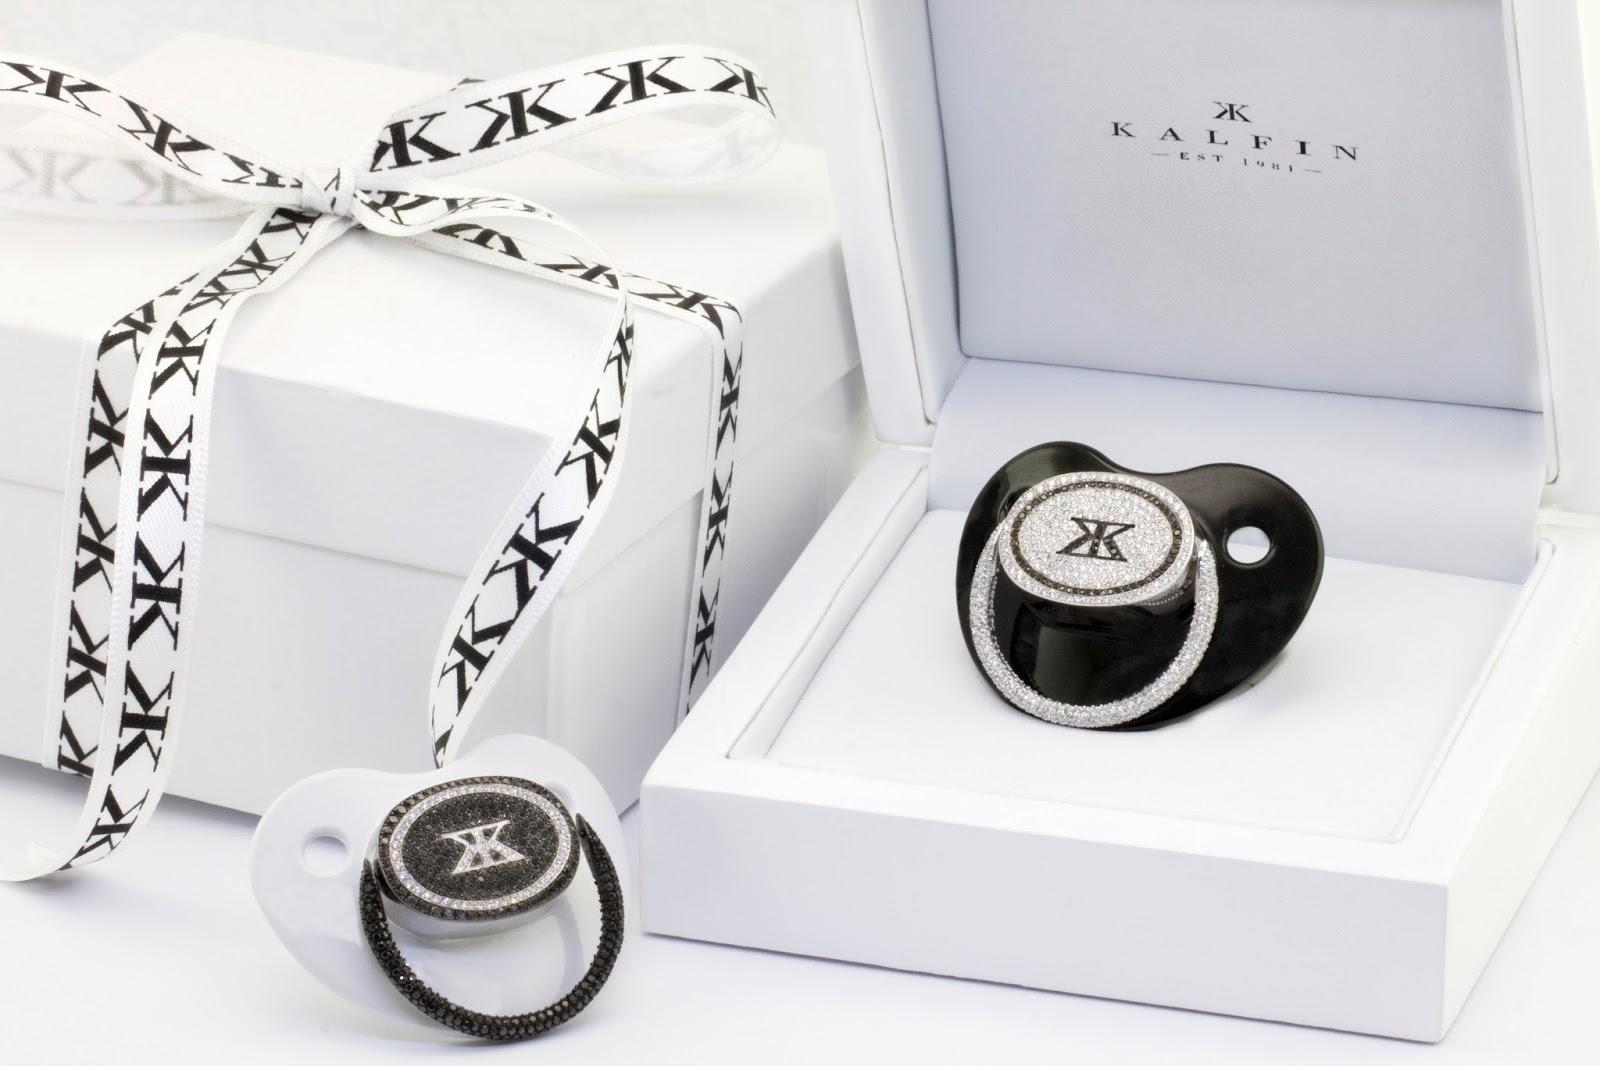 $50,000 Black Diamond pacifier to go on sale